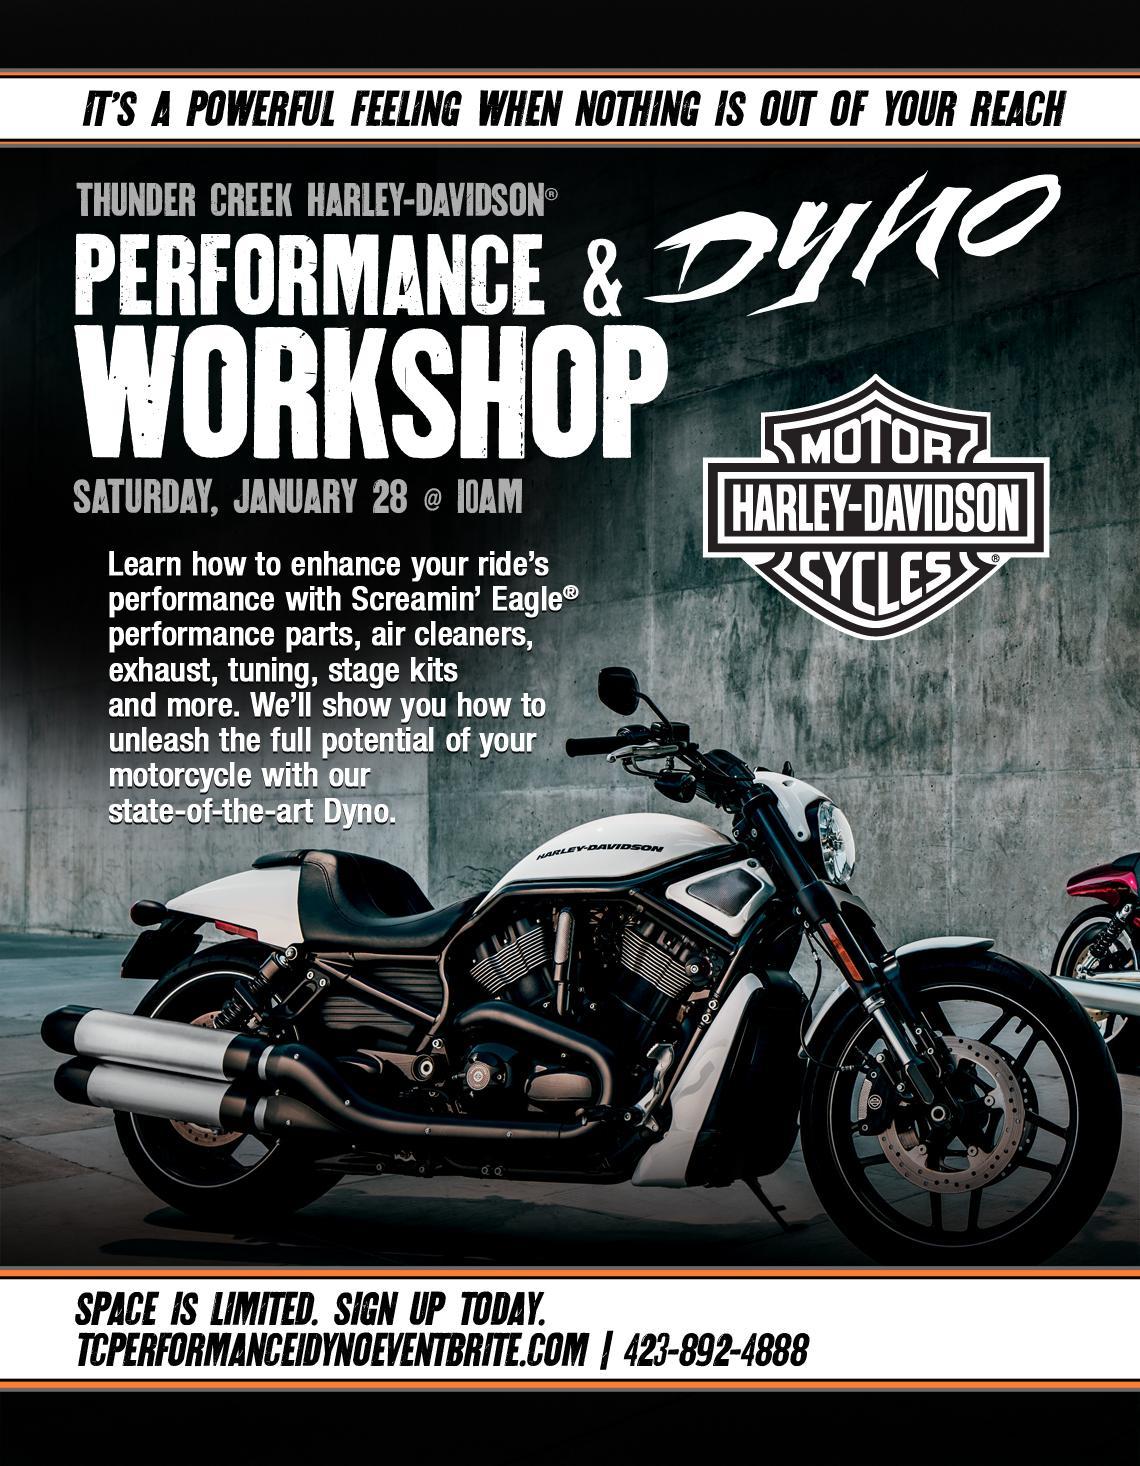 performance dyno workshop @ thunder creek harley-davidson